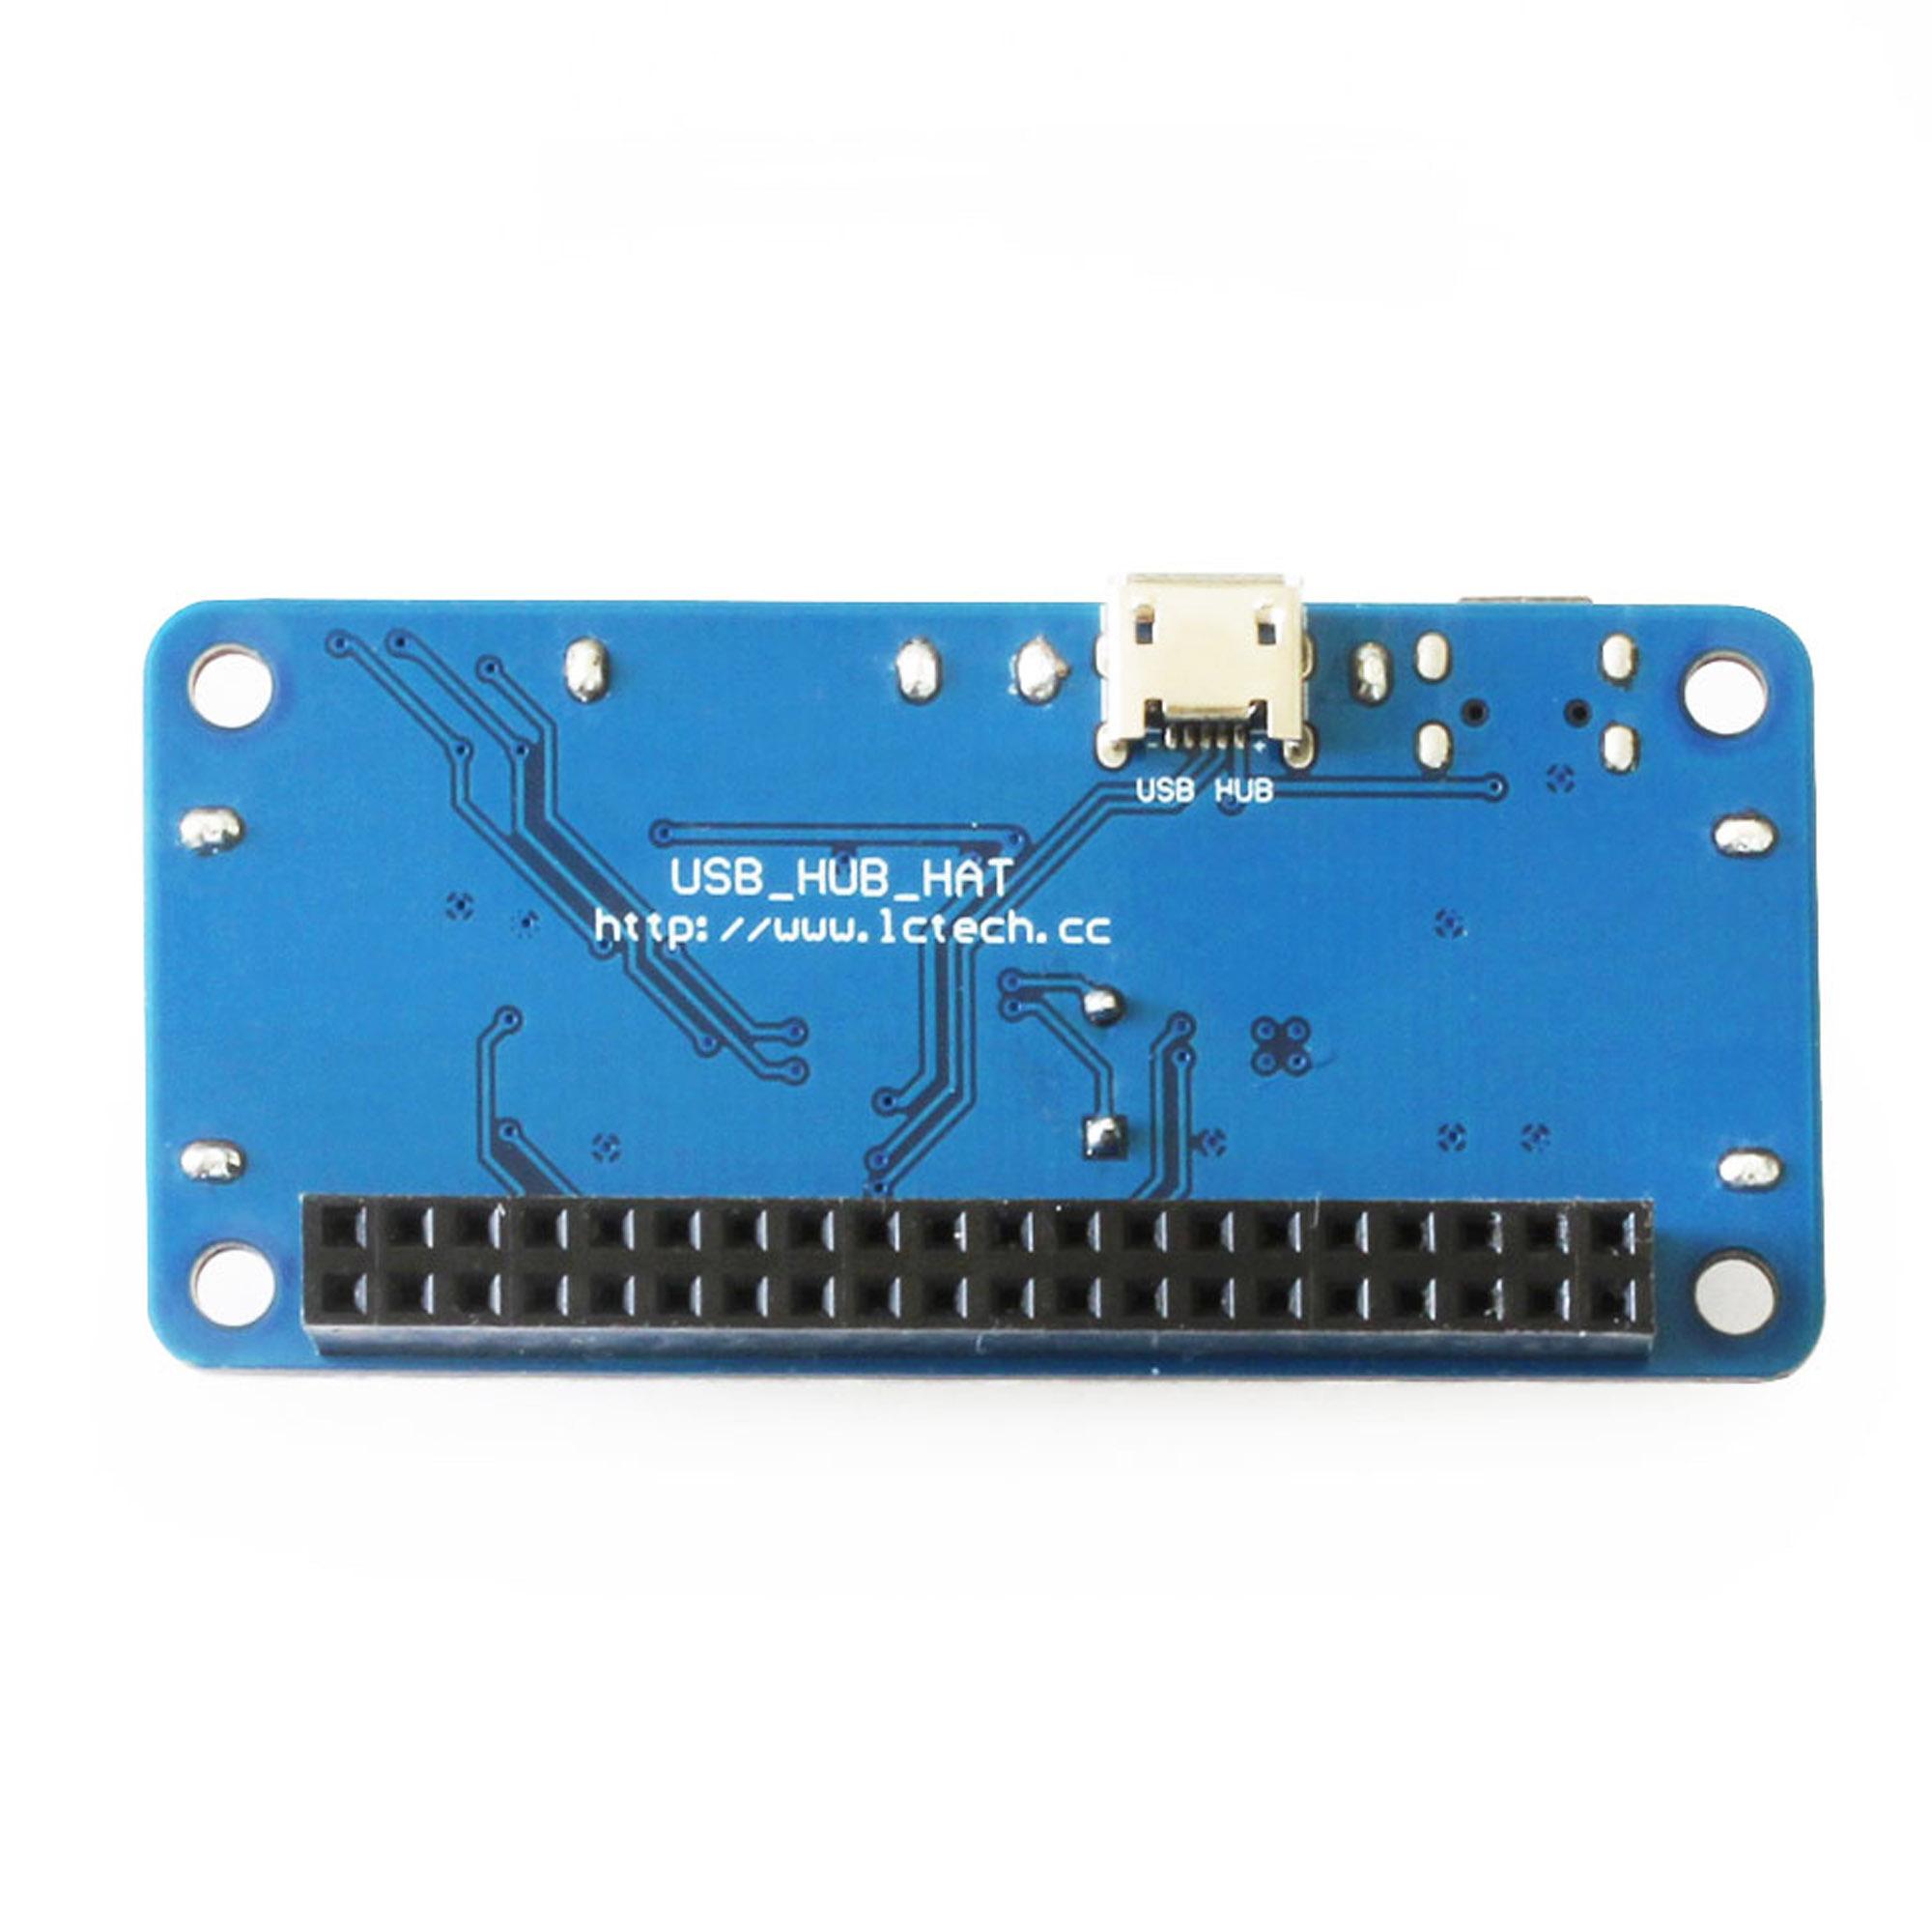 Details about 4 Port USB HUB HAT Expansion Board for Raspberry Pi 3 Model B  /Zero V1,3/Zero W